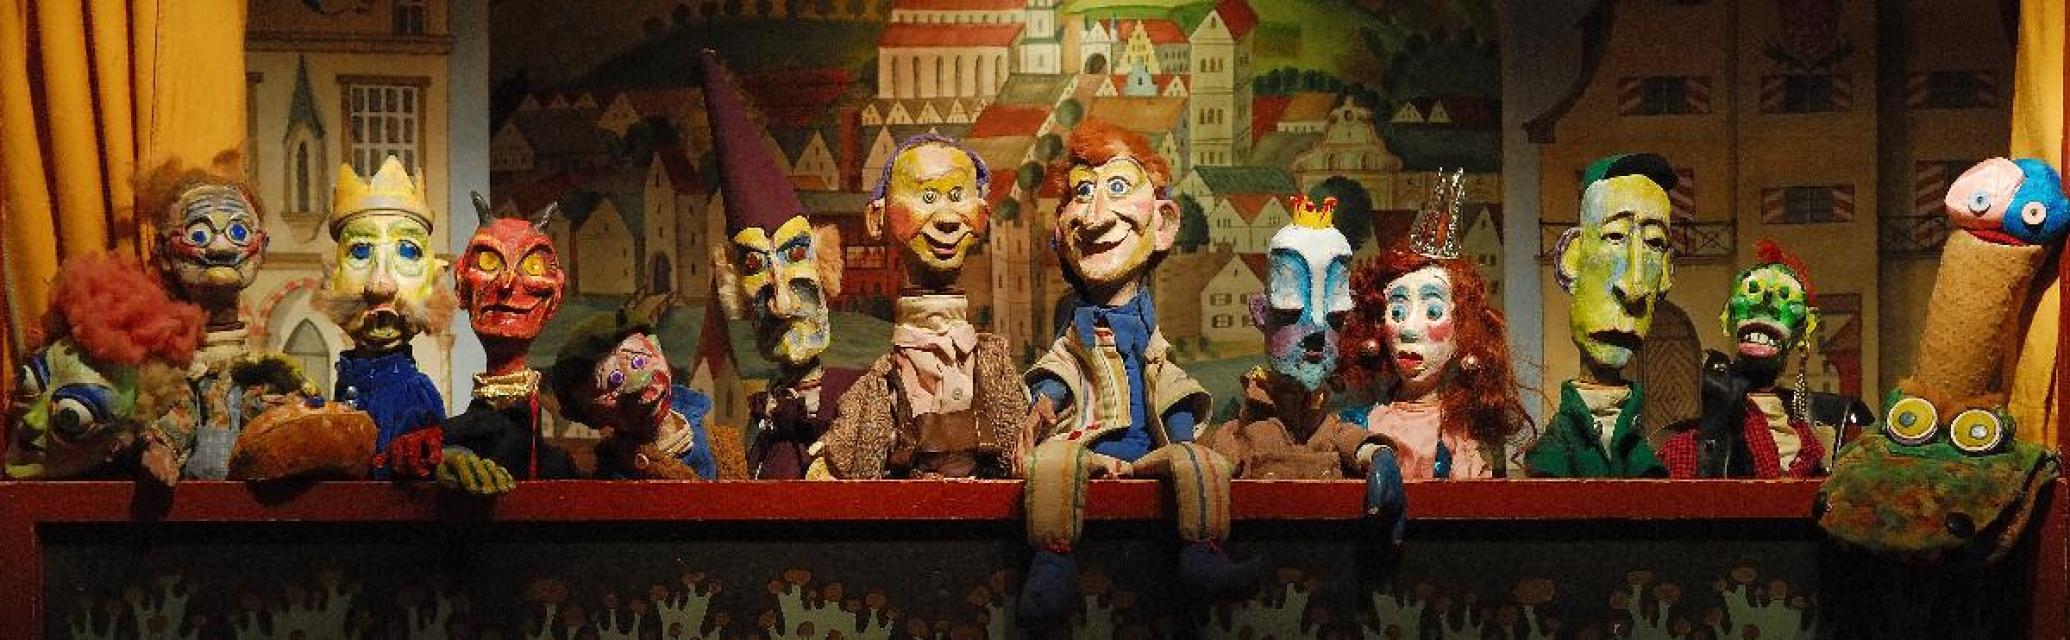 "Dr. Döblingers geschmackvolles Kasperltheater: ""Kasperl und die Stinkprinzessin"""